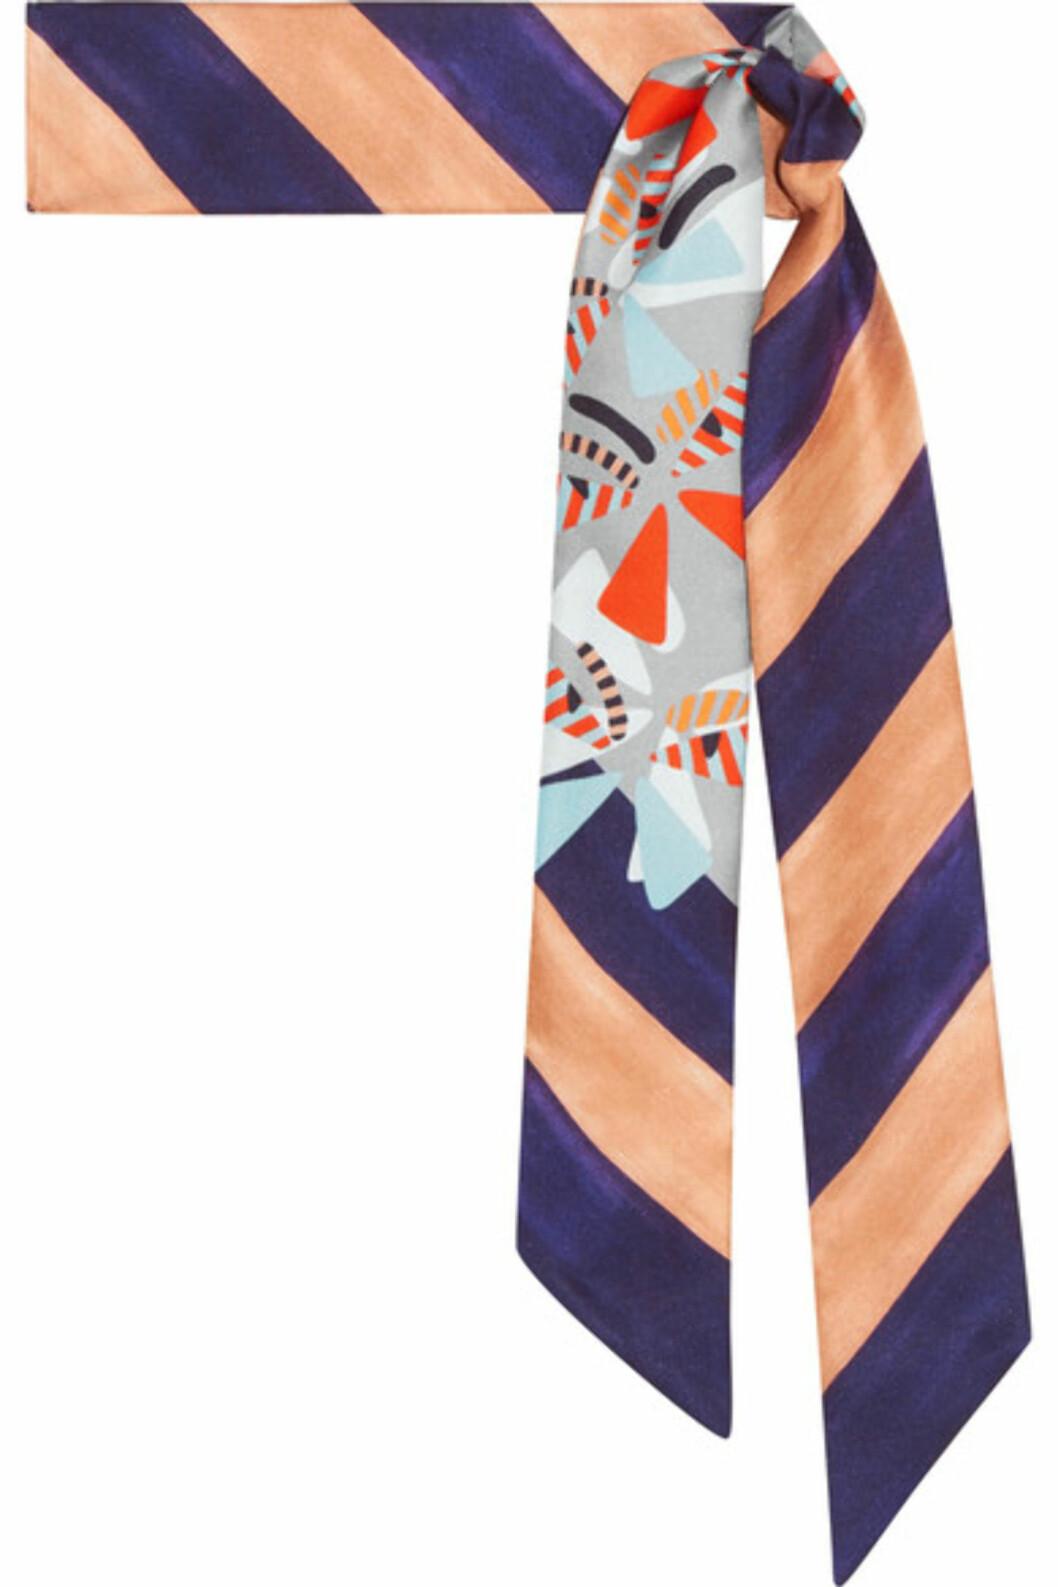 Silkeskjerf fra Fendi via Net-a-porter.com |1500,-| https://www.net-a-porter.com/no/en/product/894340/fendi/printed-silk-twill-scarf